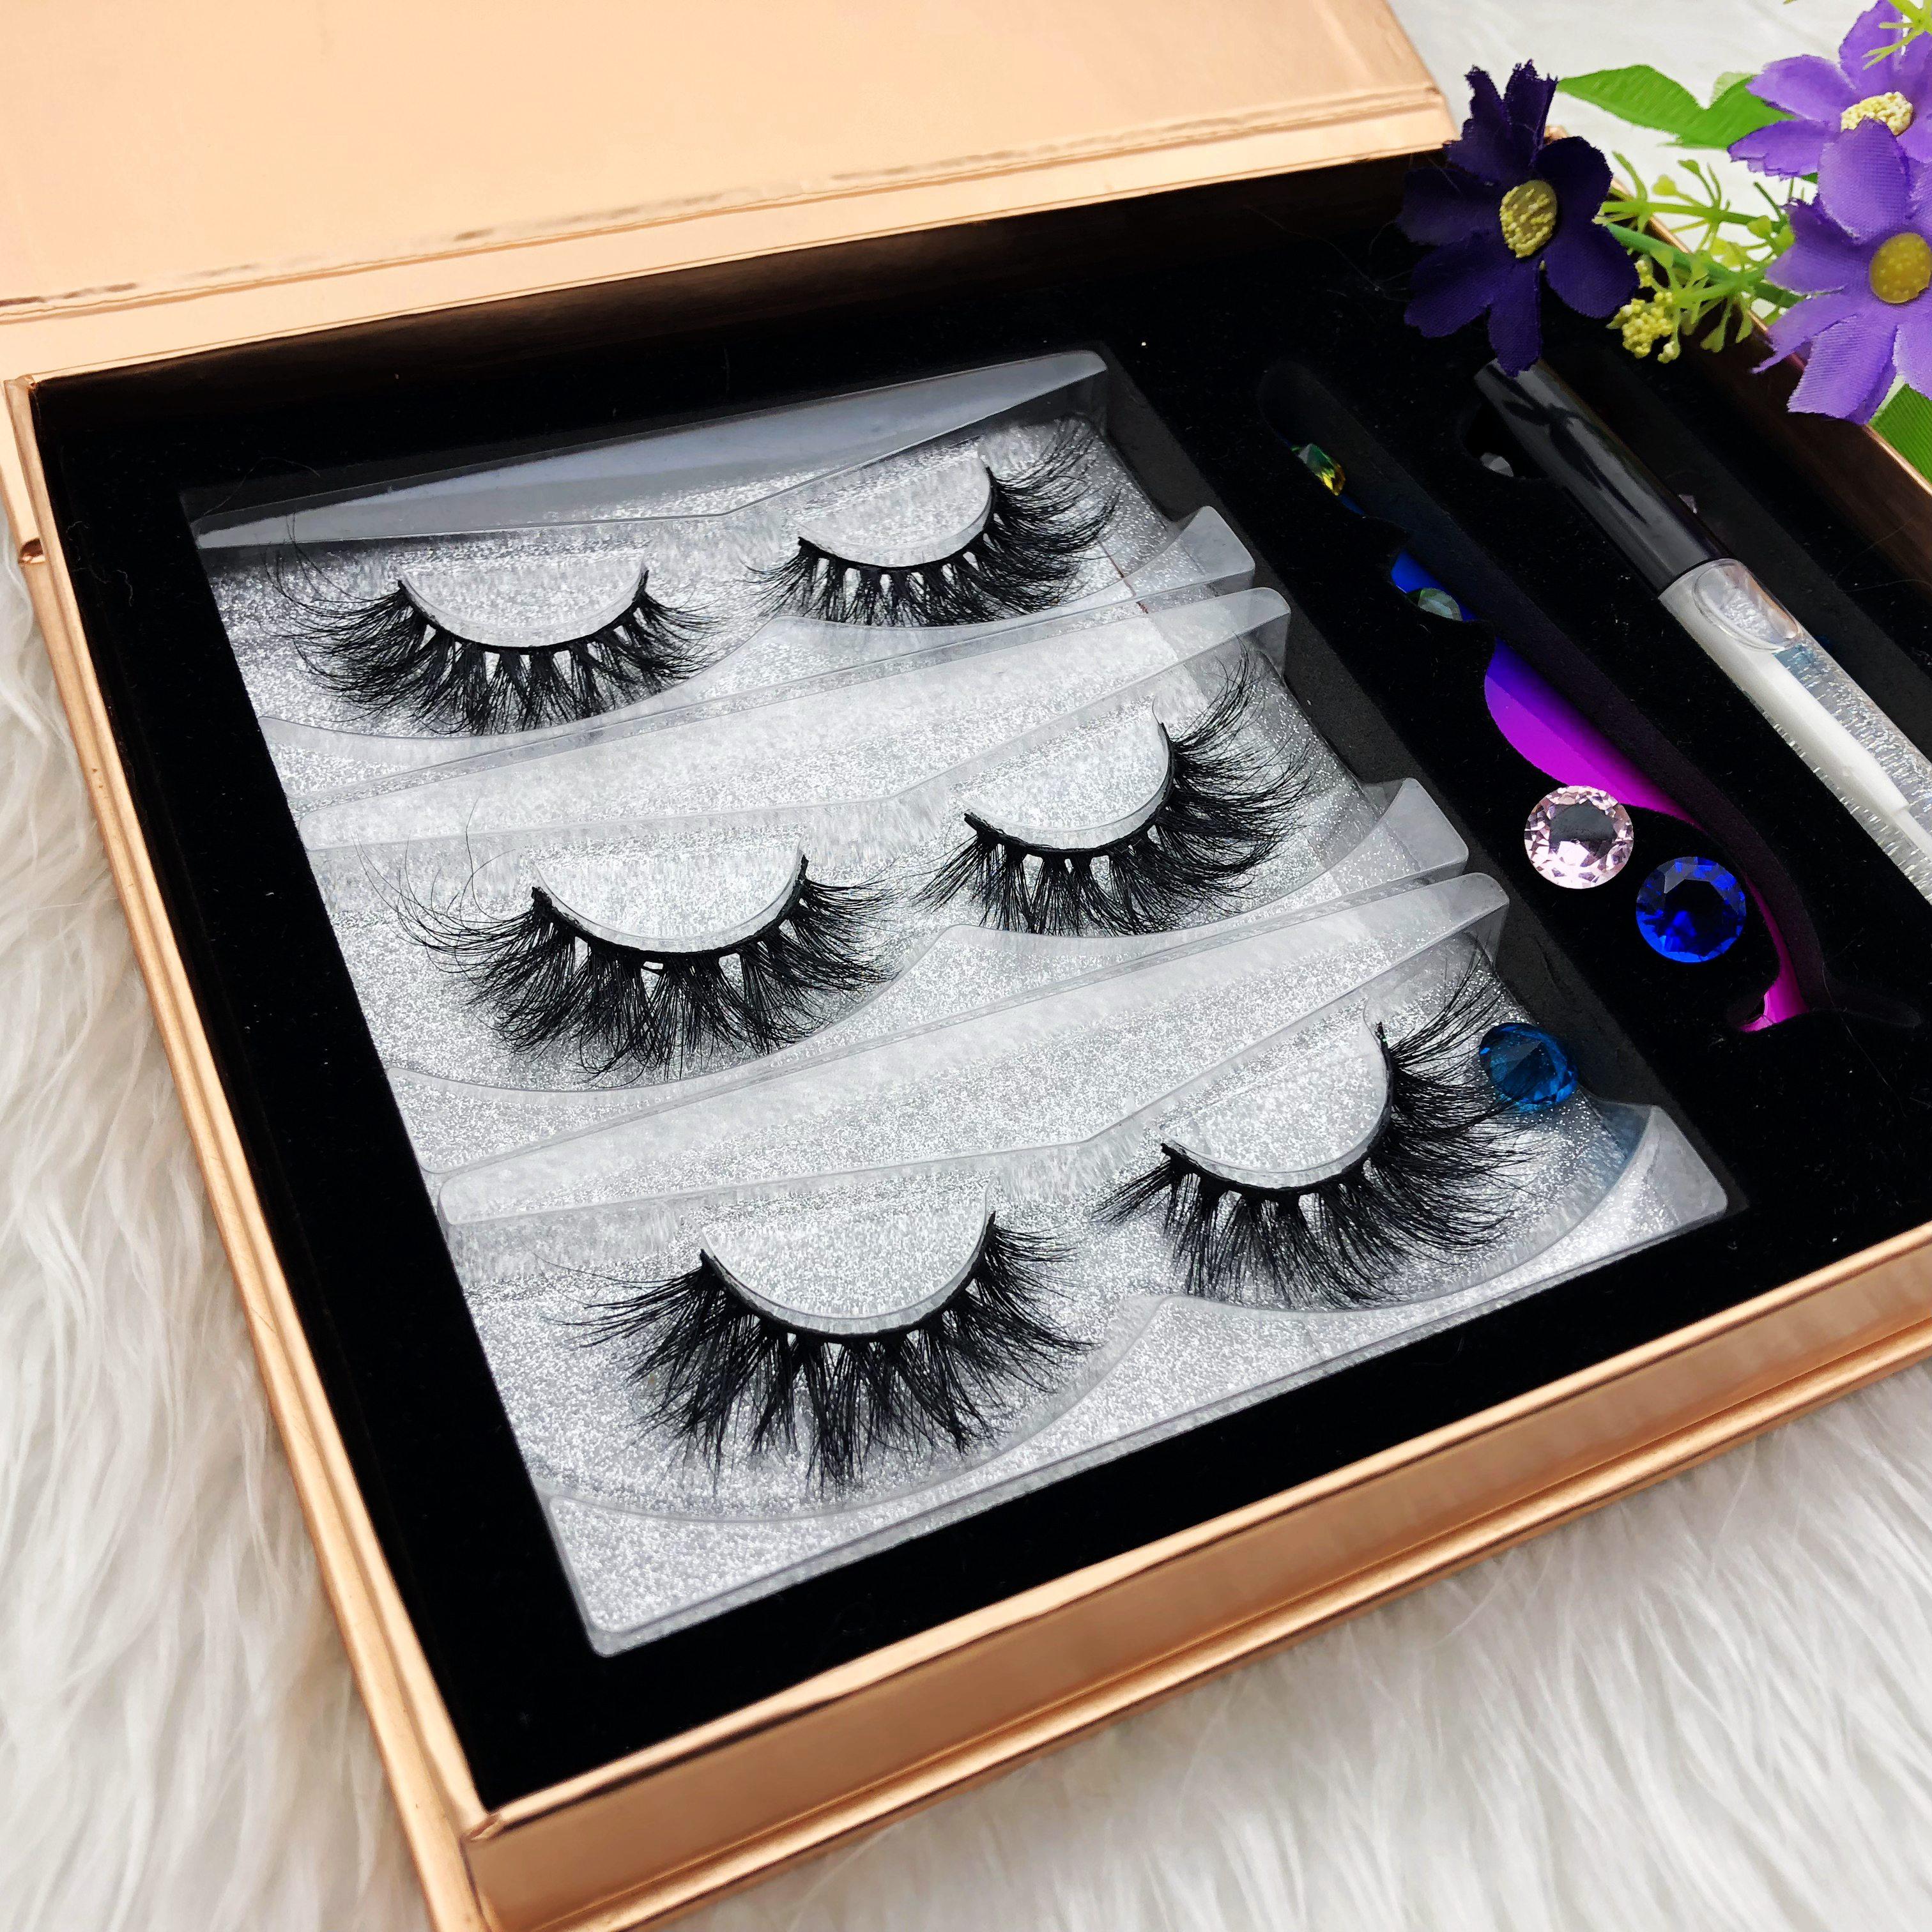 glue lash extentionlash mink extention Lshes 5d mink eyelashes eyelash packaging rose gold strip eye lash case, Natural black